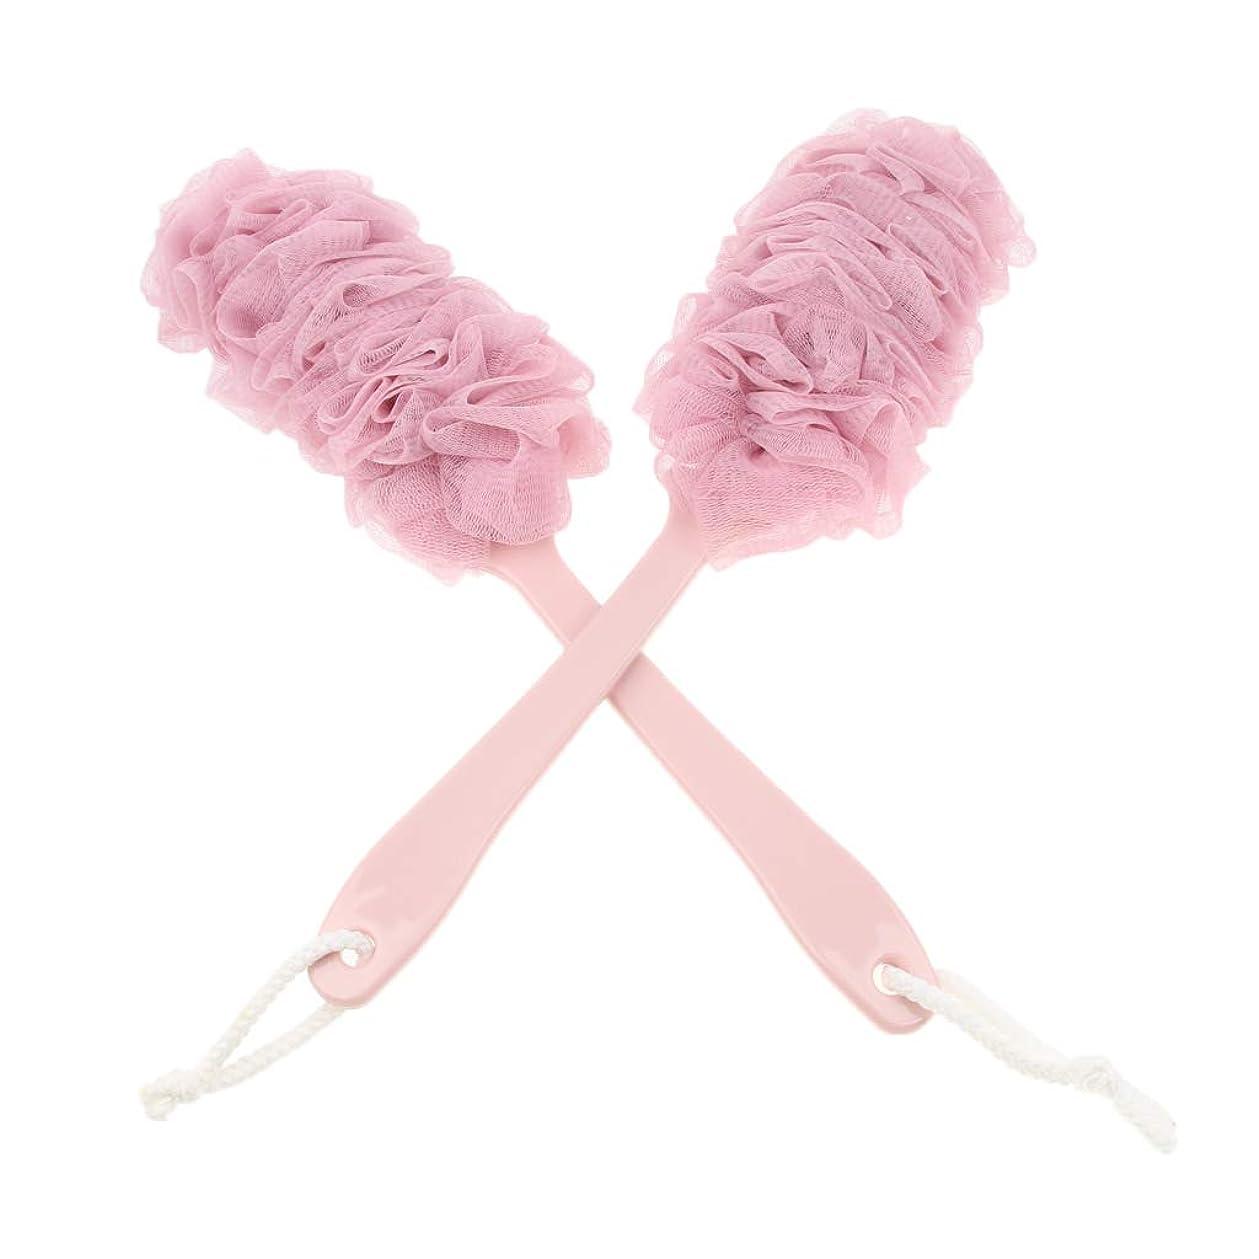 Fenteer 2個 バスシャワースポンジ パフ スクラバーブラシ ソフト 泡を作り 3色選べ - ピンク